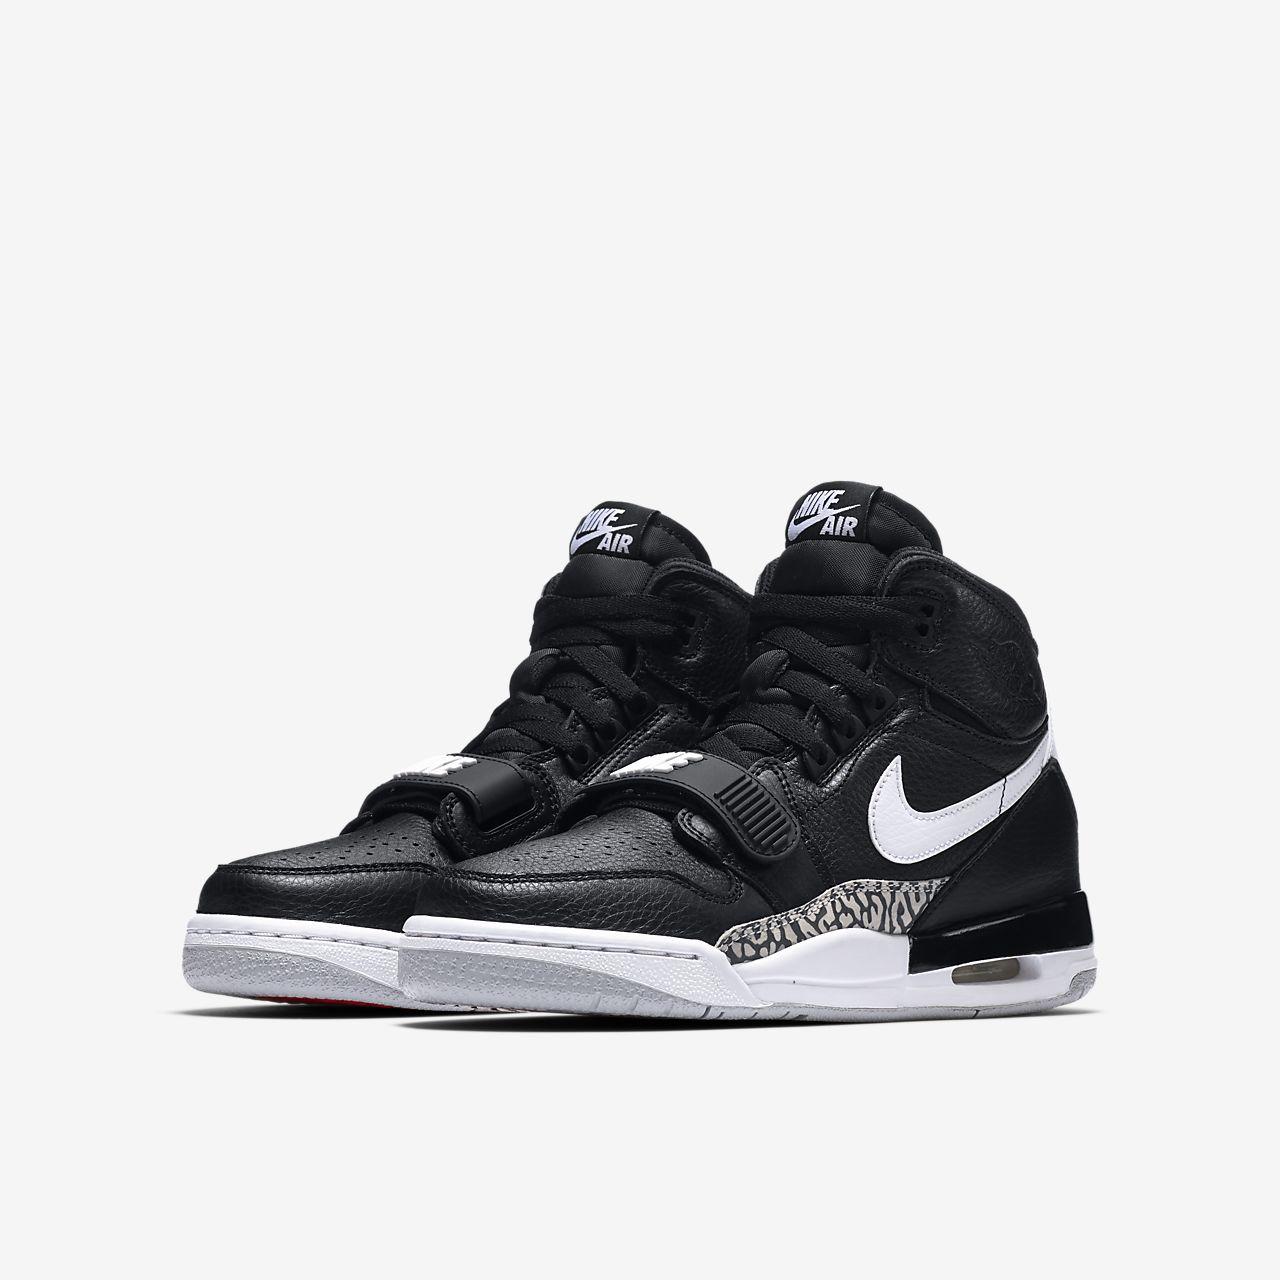 17decd6db5ff21 Air Jordan Legacy 312 Older Kids  Shoe. Nike.com GB